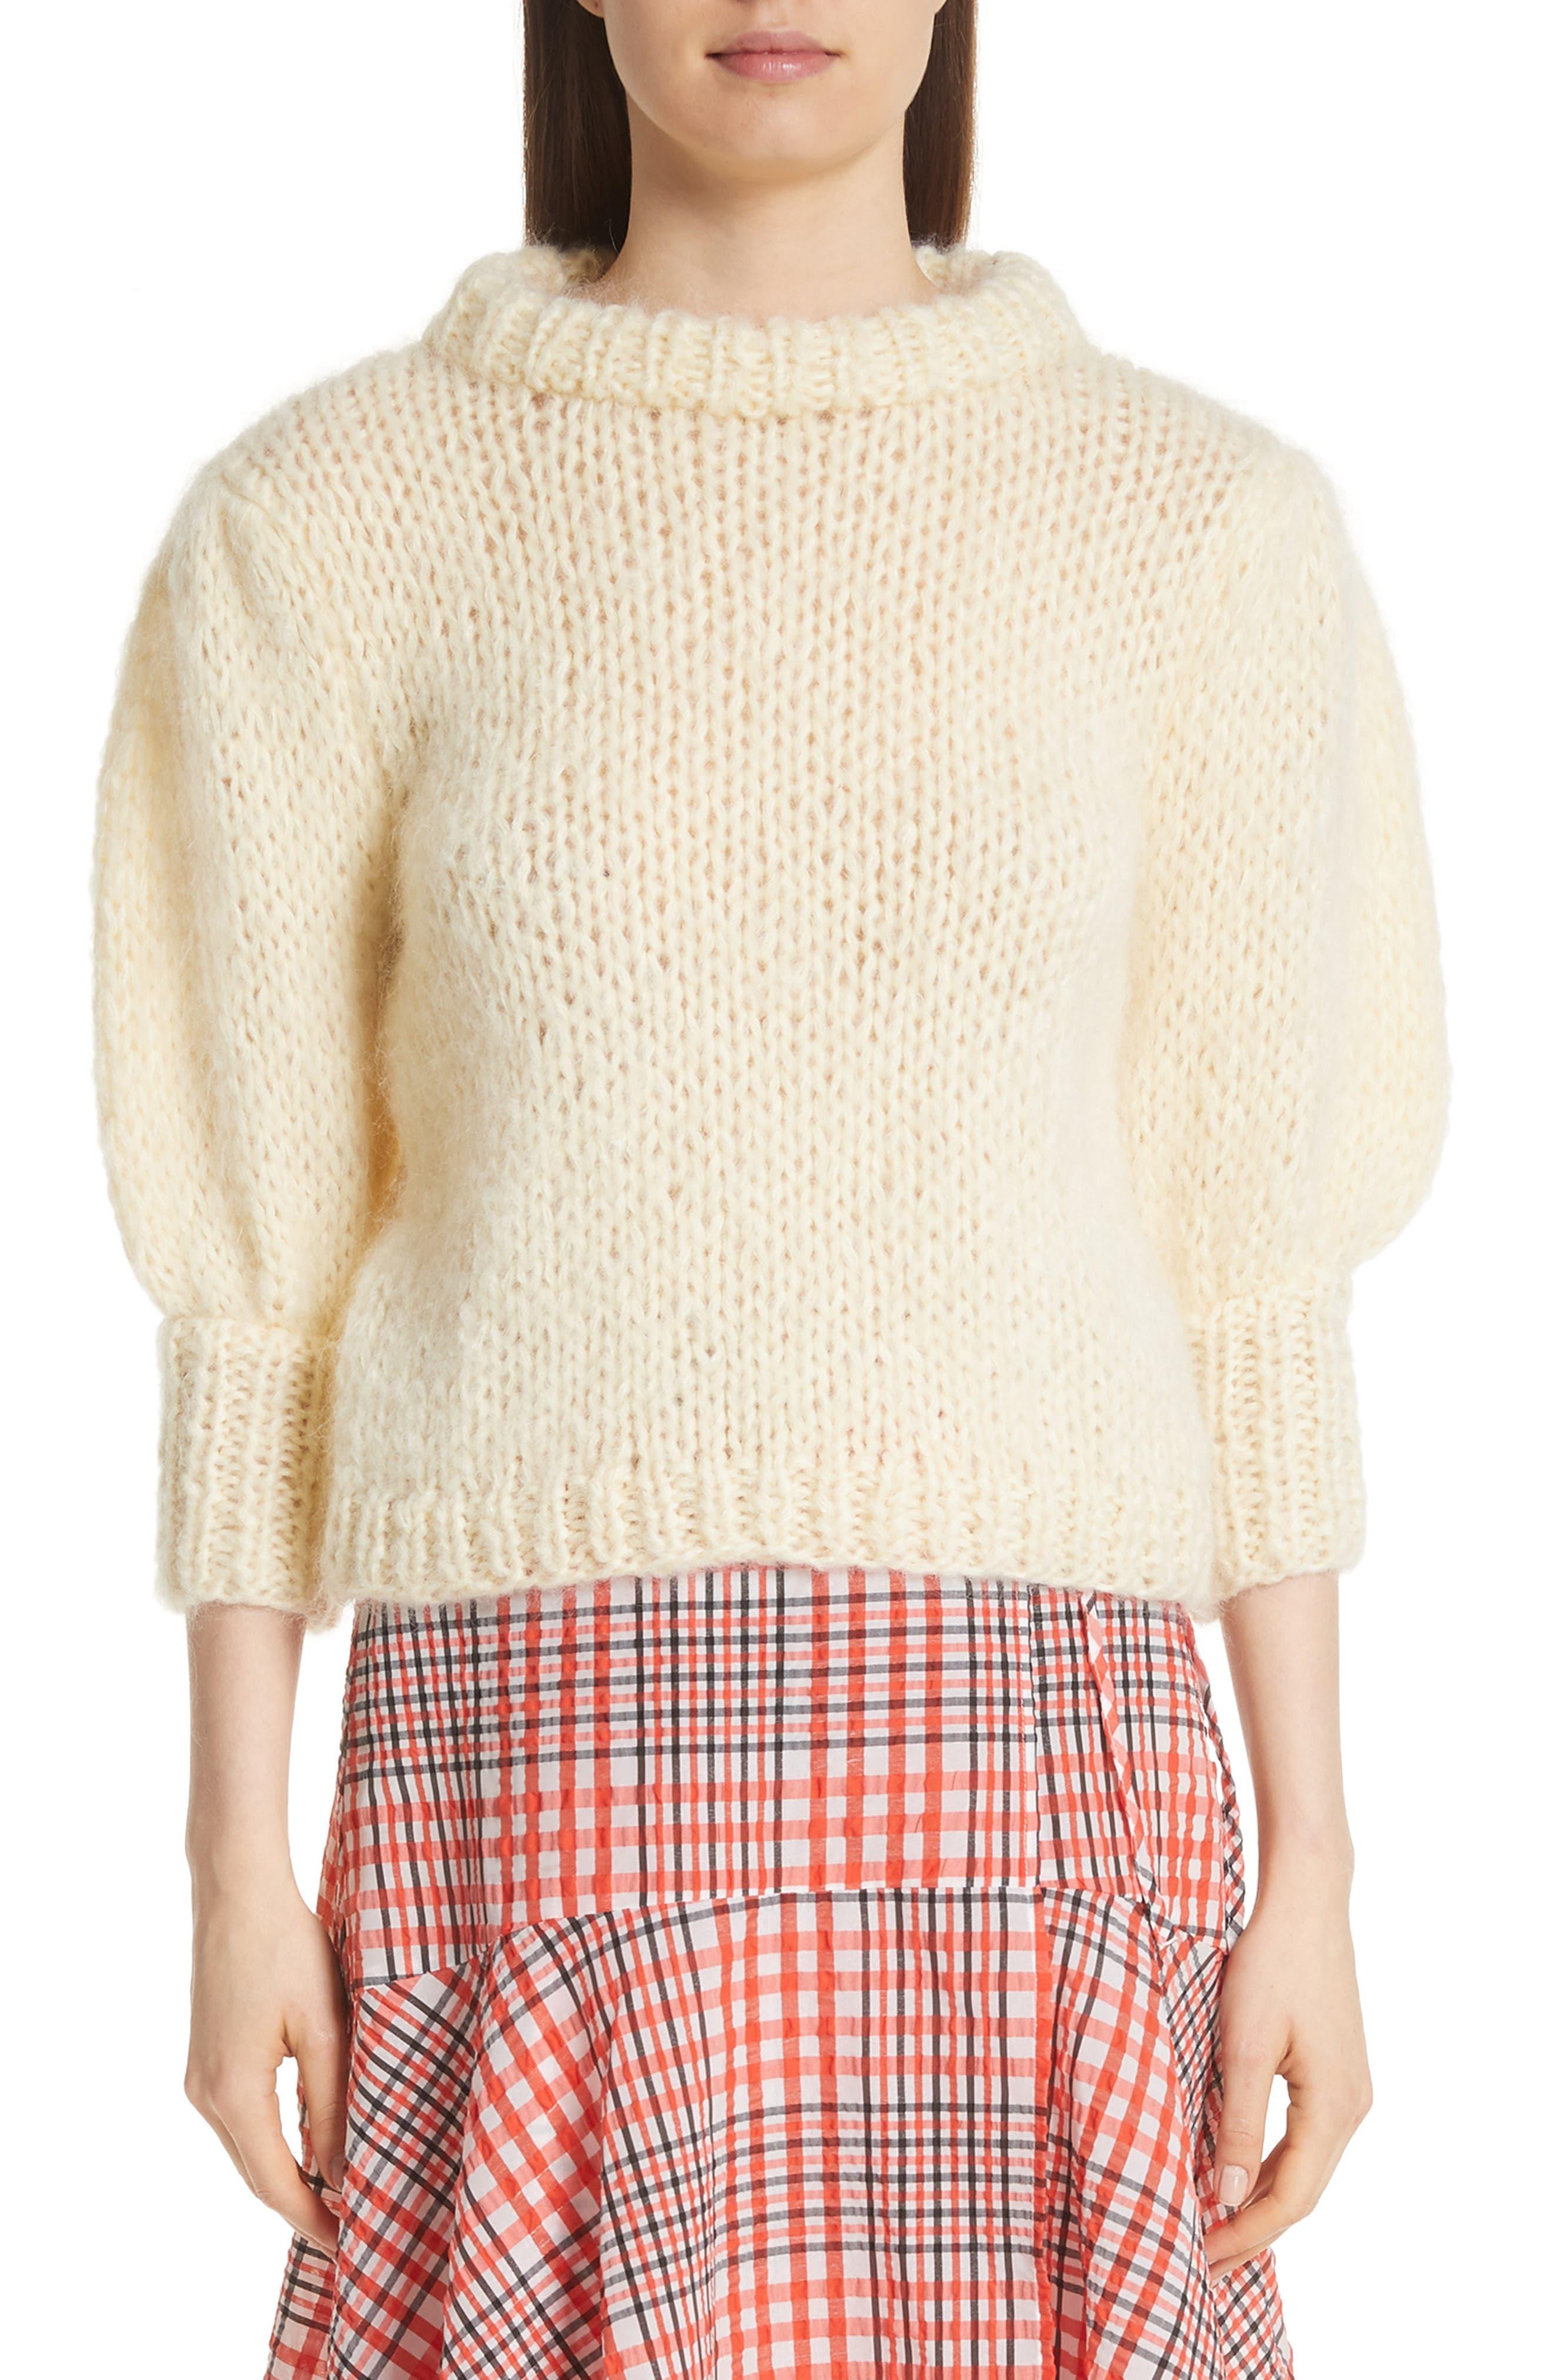 Juilliard Mohair & Wool Puff Sleeve Sweater,                             Main thumbnail 1, color,                             900